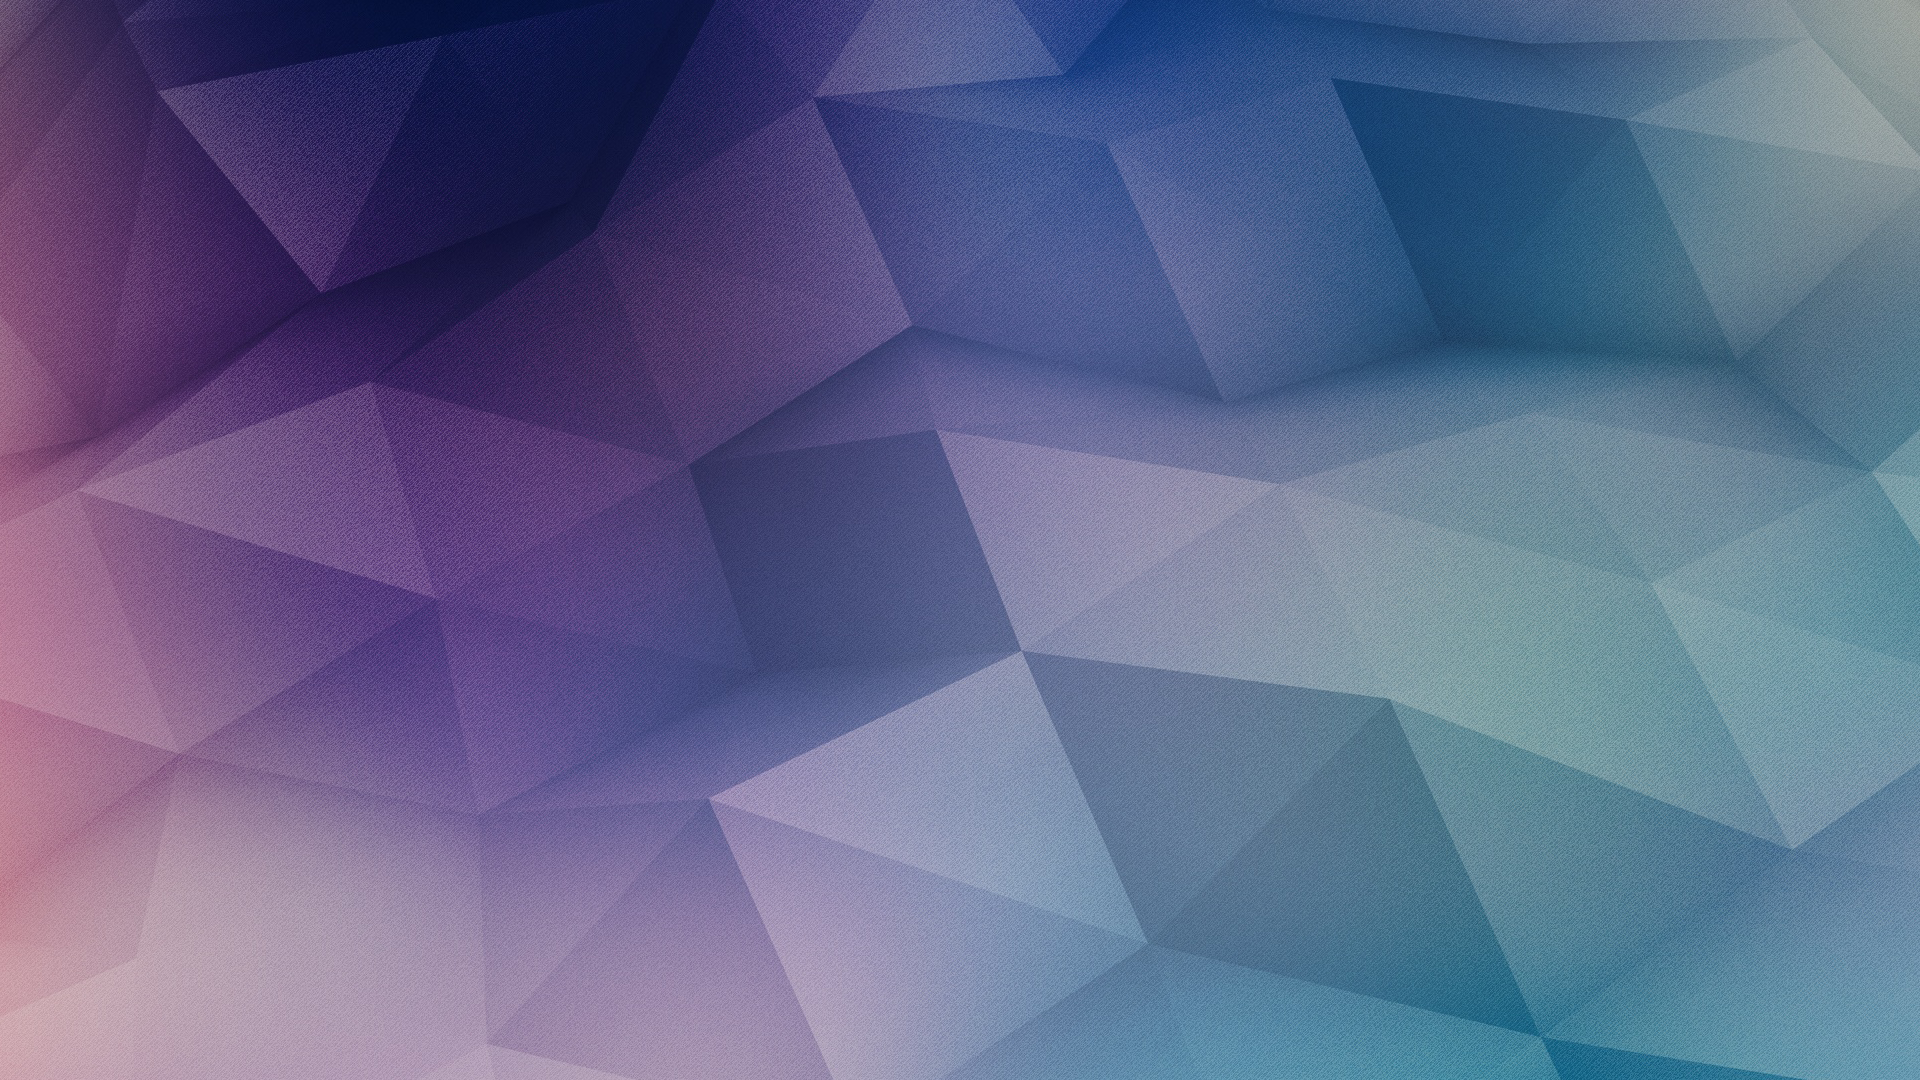 Geometry Mochi Triangles Wallpaper 2594238 Wallbase Cc Abstract Wallpaper Wallpaper Green Wallpaper